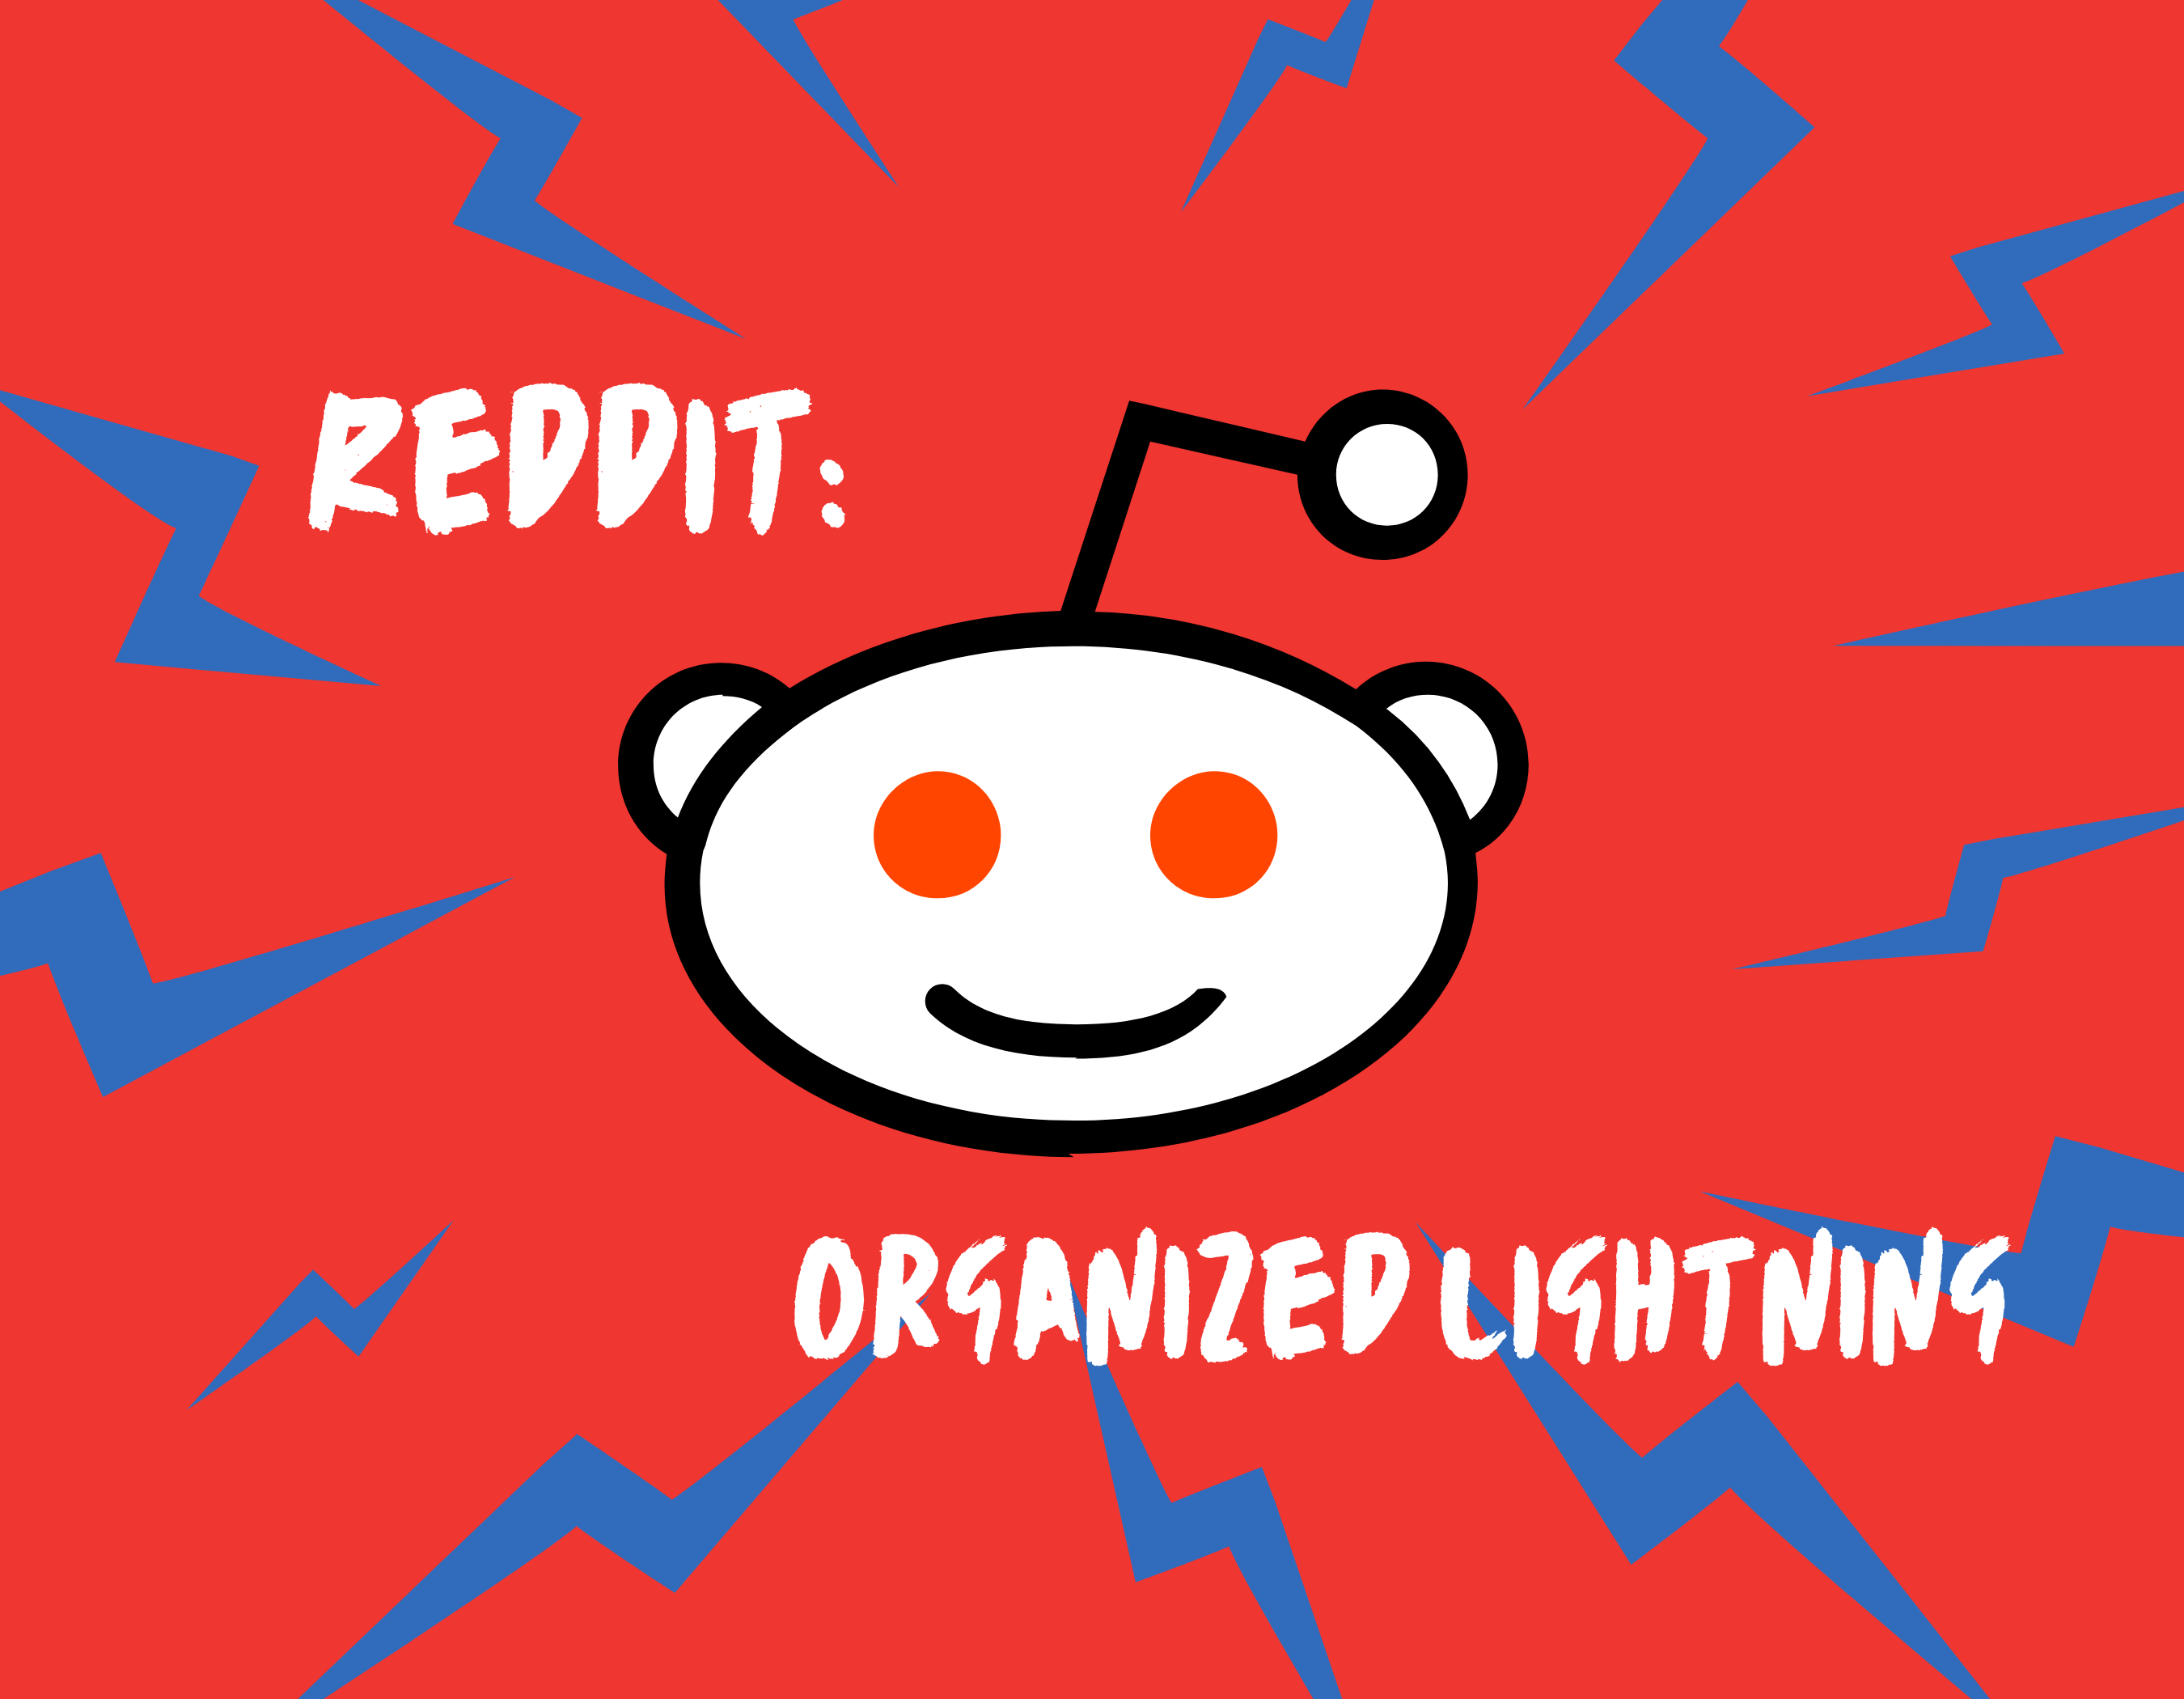 Reddit: Organized Lightning